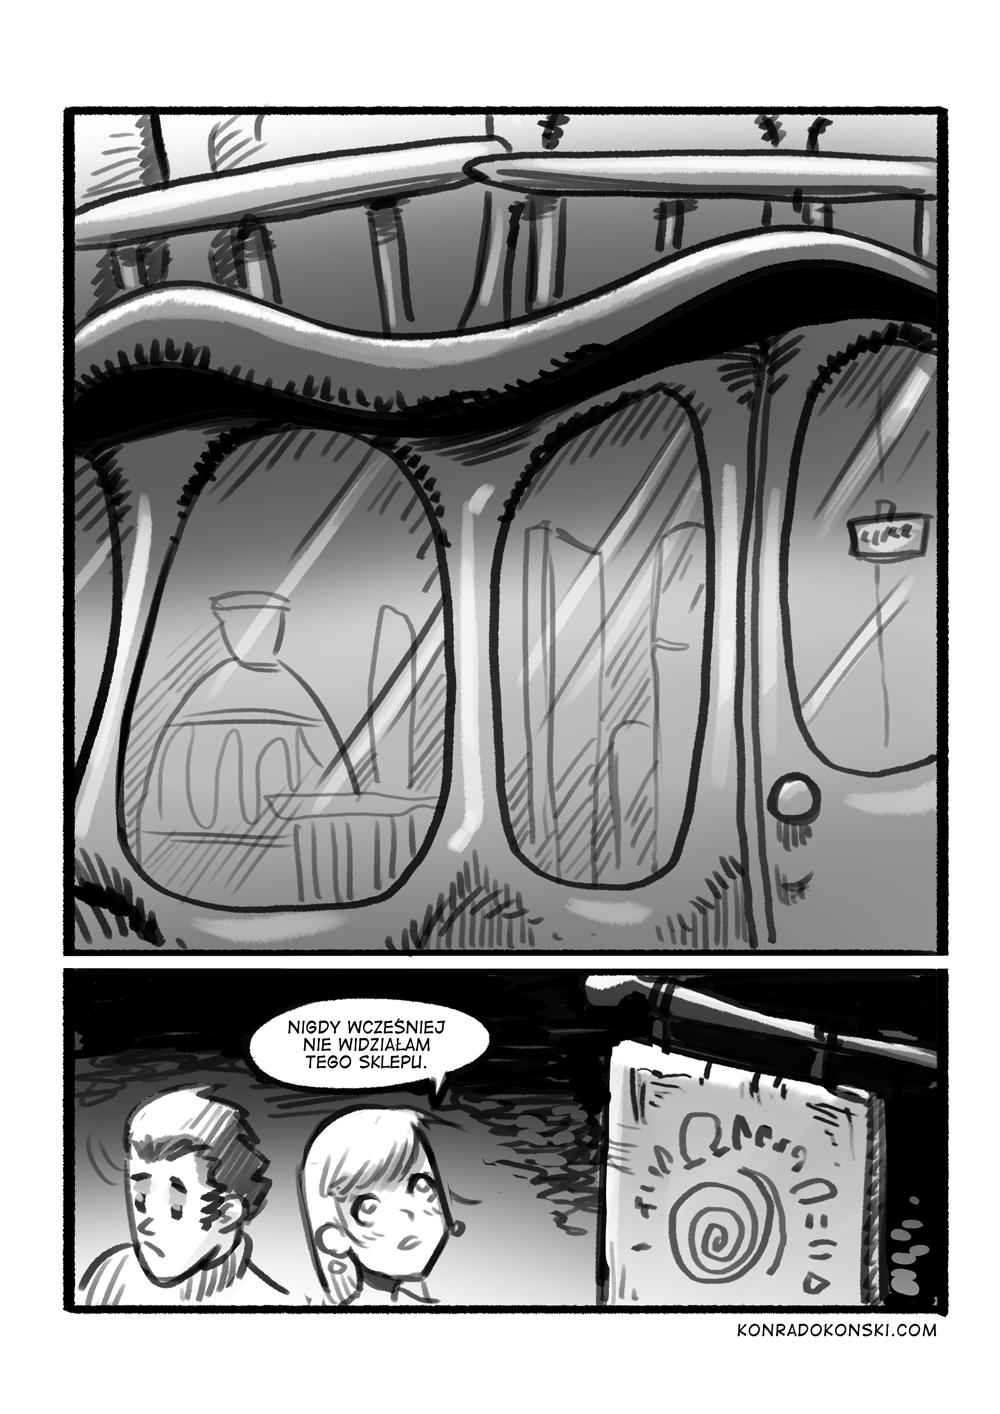 Gratka – komiks 24h – 07